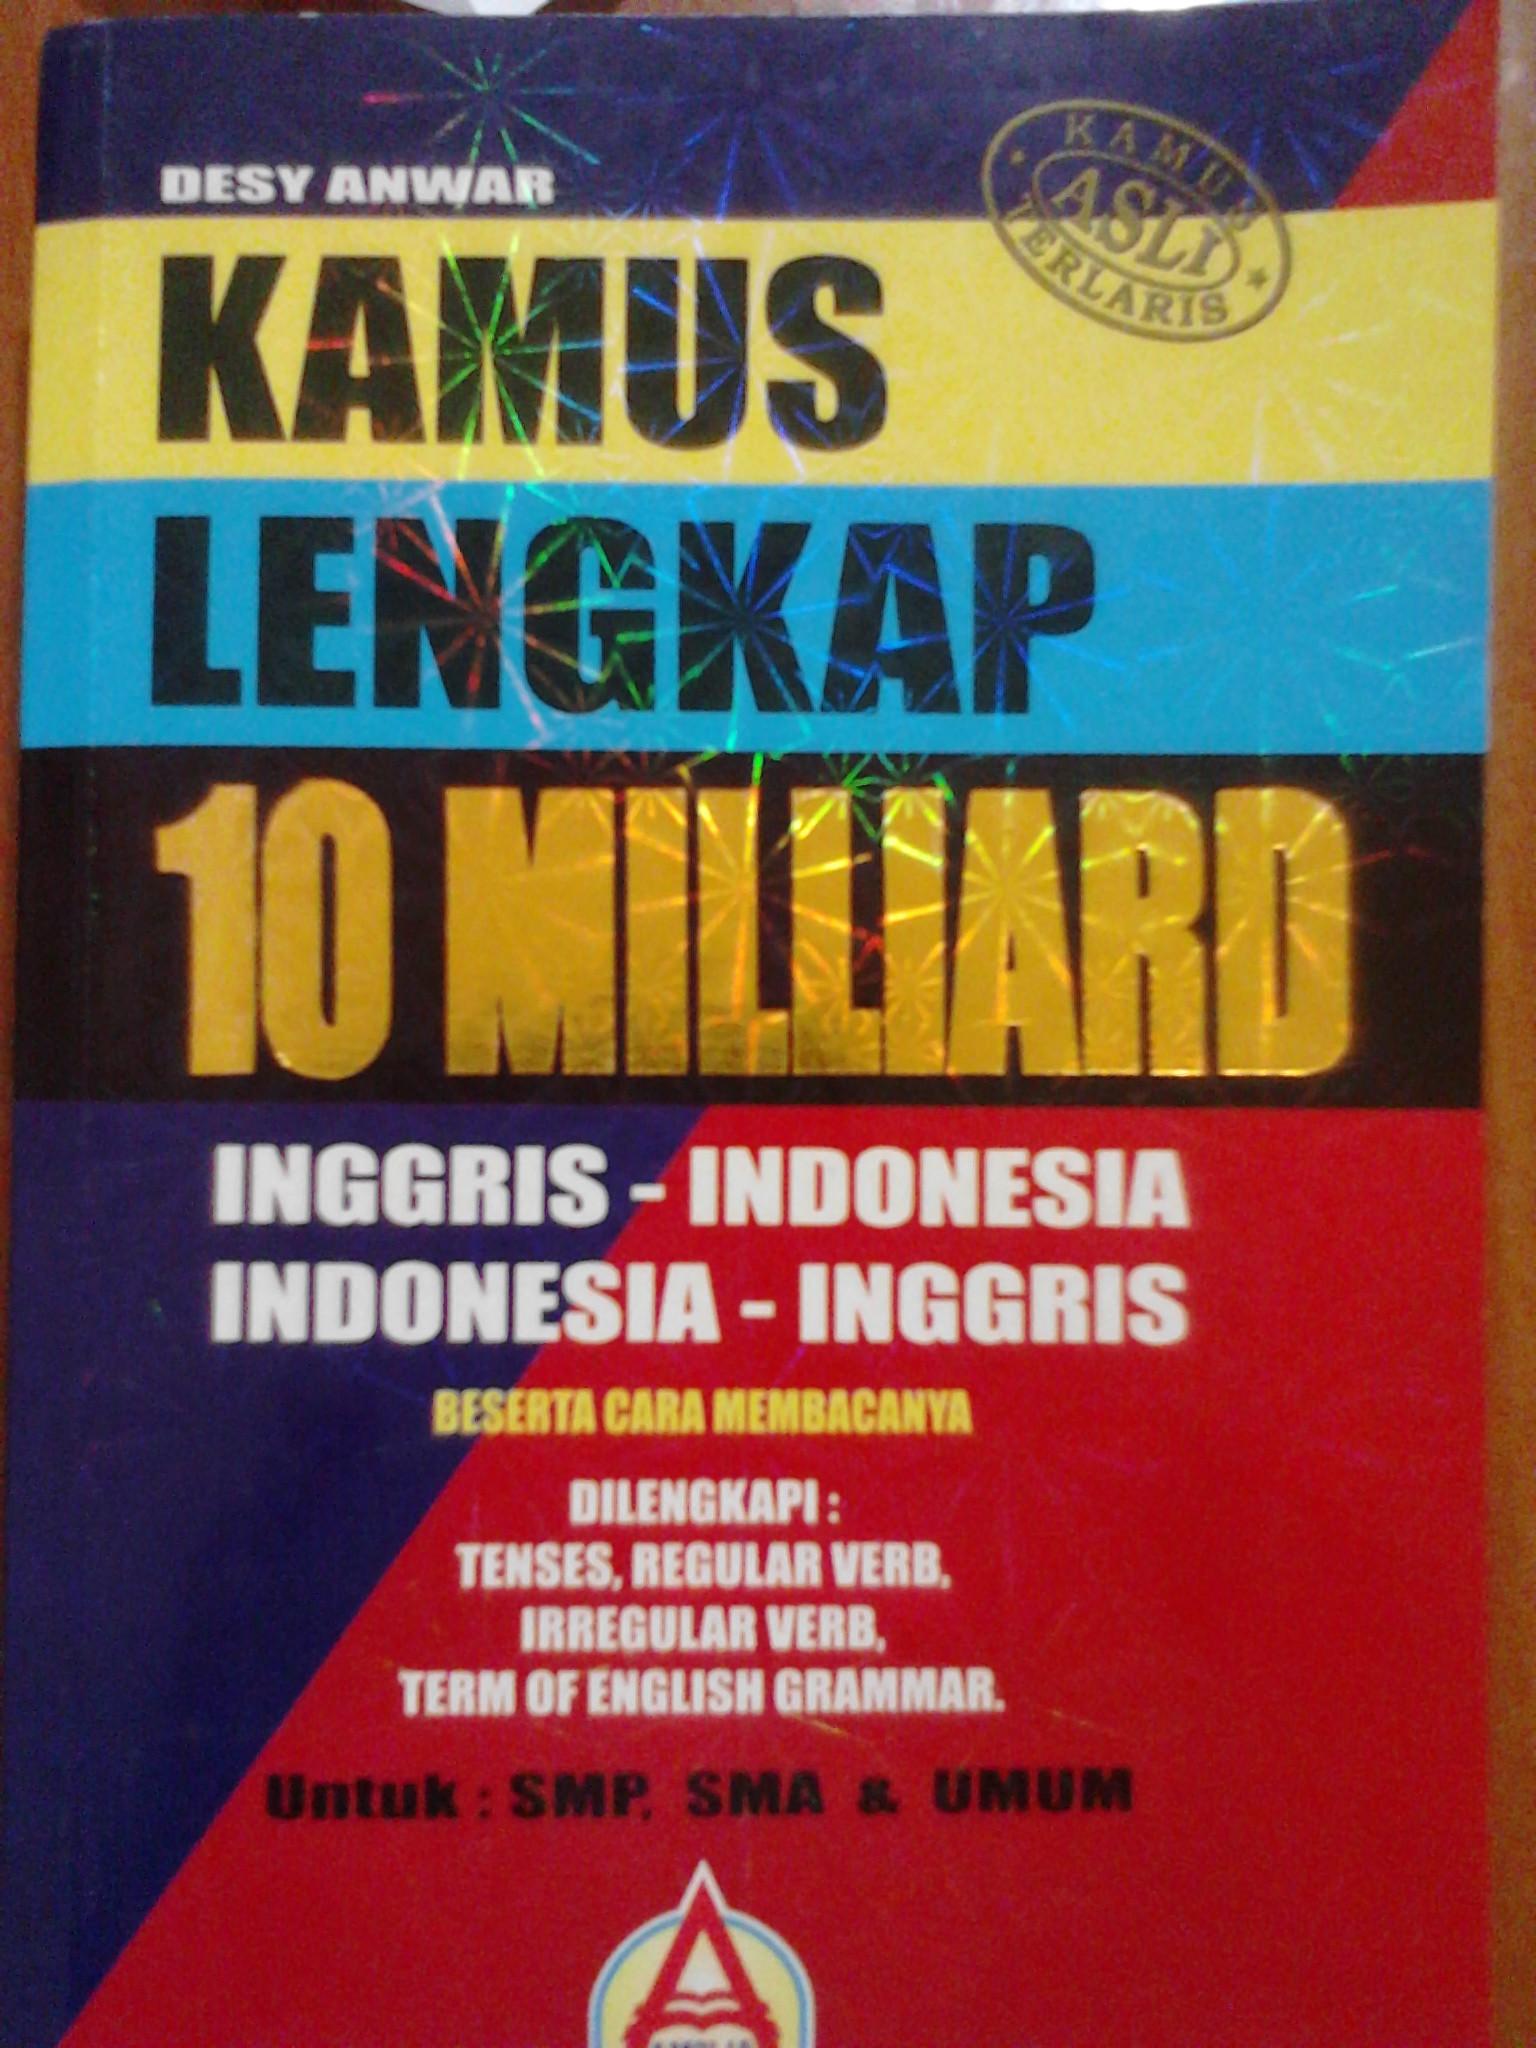 Jual dictionary kamus bahasa inggris indonesia lino jaya mandiri jual dictionary kamus bahasa inggris indonesia lino jaya mandiri tokopedia stopboris Choice Image